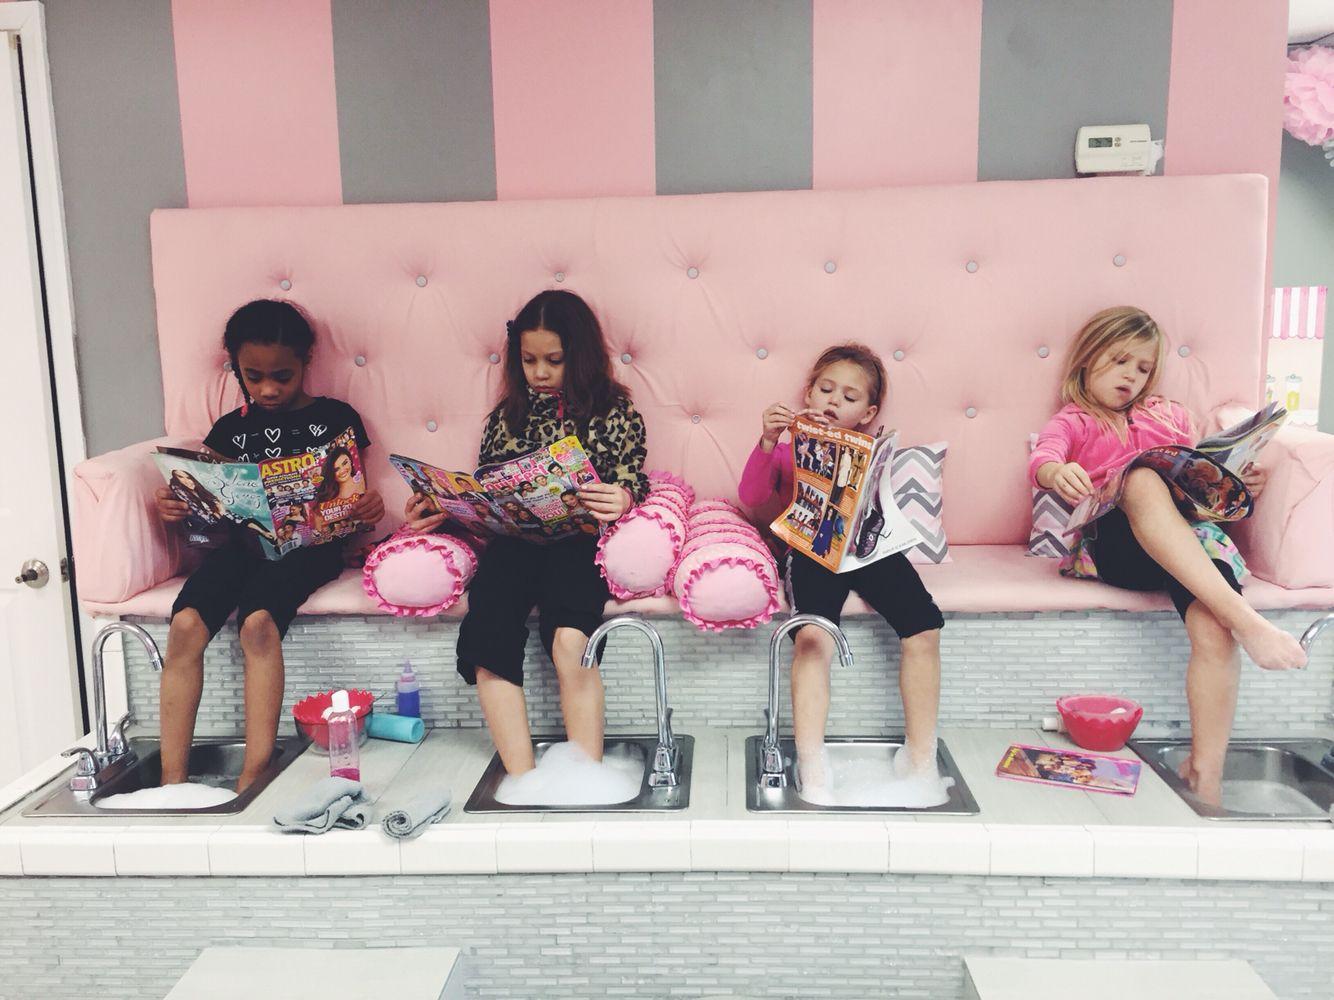 Kids Spa Pedicure Bench  Sassy Princess Spa for Girls  D r e a m s in 2019  Nail salon decor